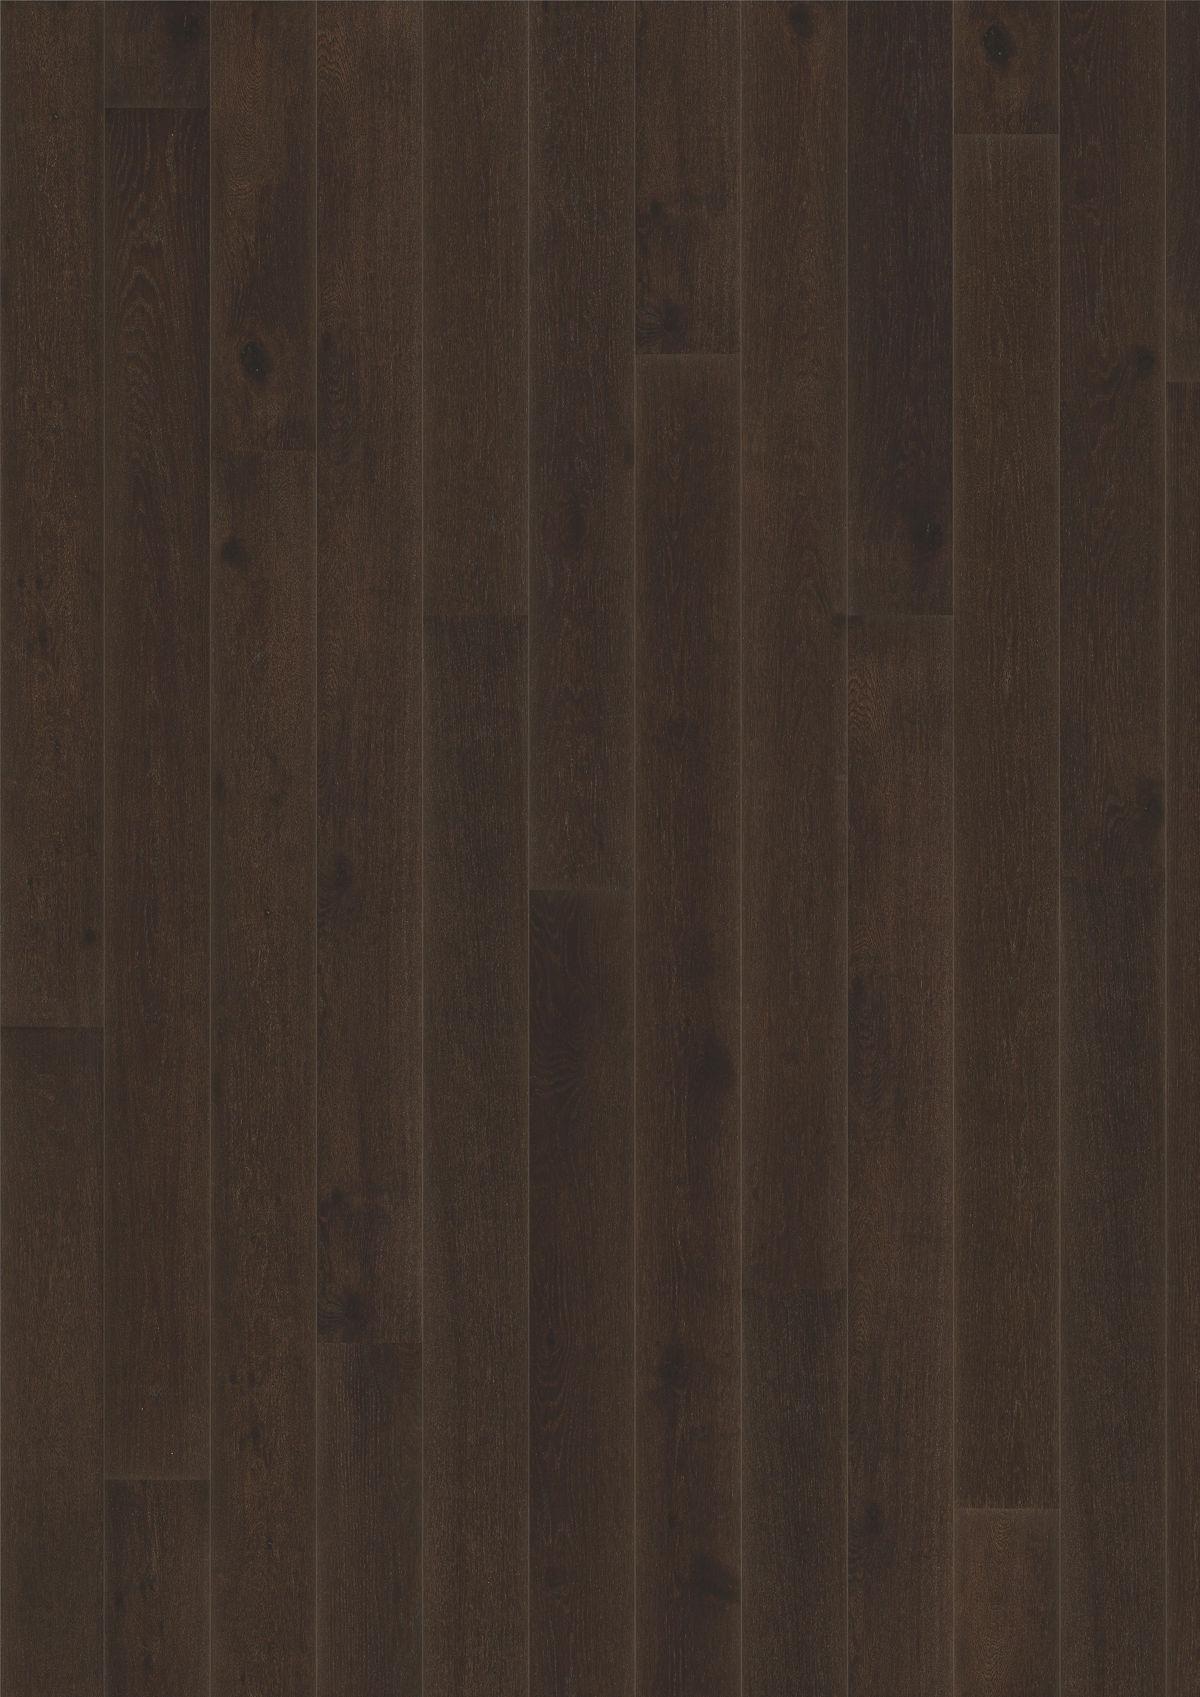 kahrs oak nouveau black engineered wood flooring. Black Bedroom Furniture Sets. Home Design Ideas